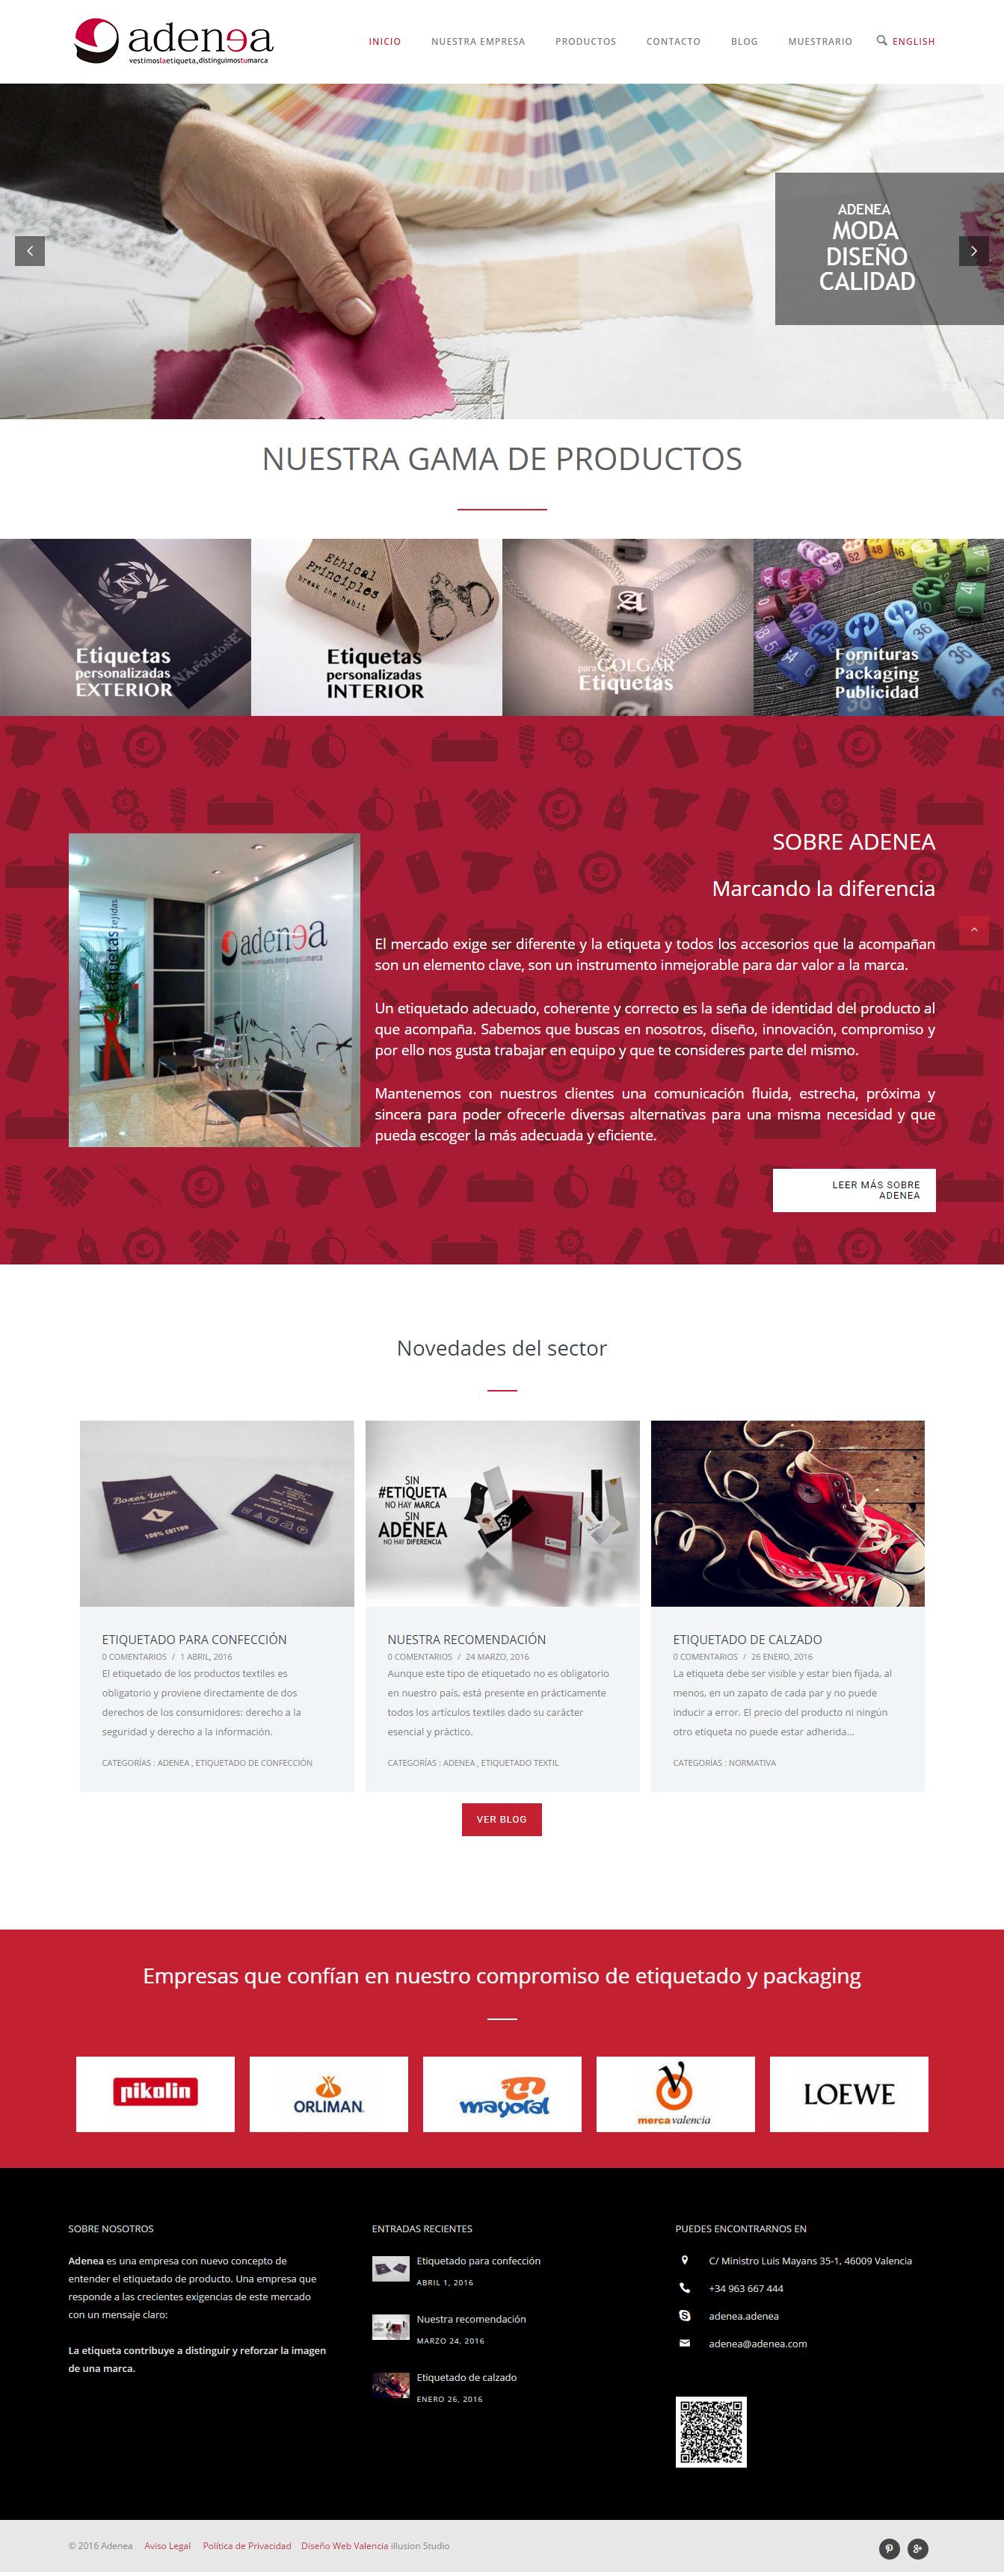 Proyecto de Diseño Web Adenea imagen 3